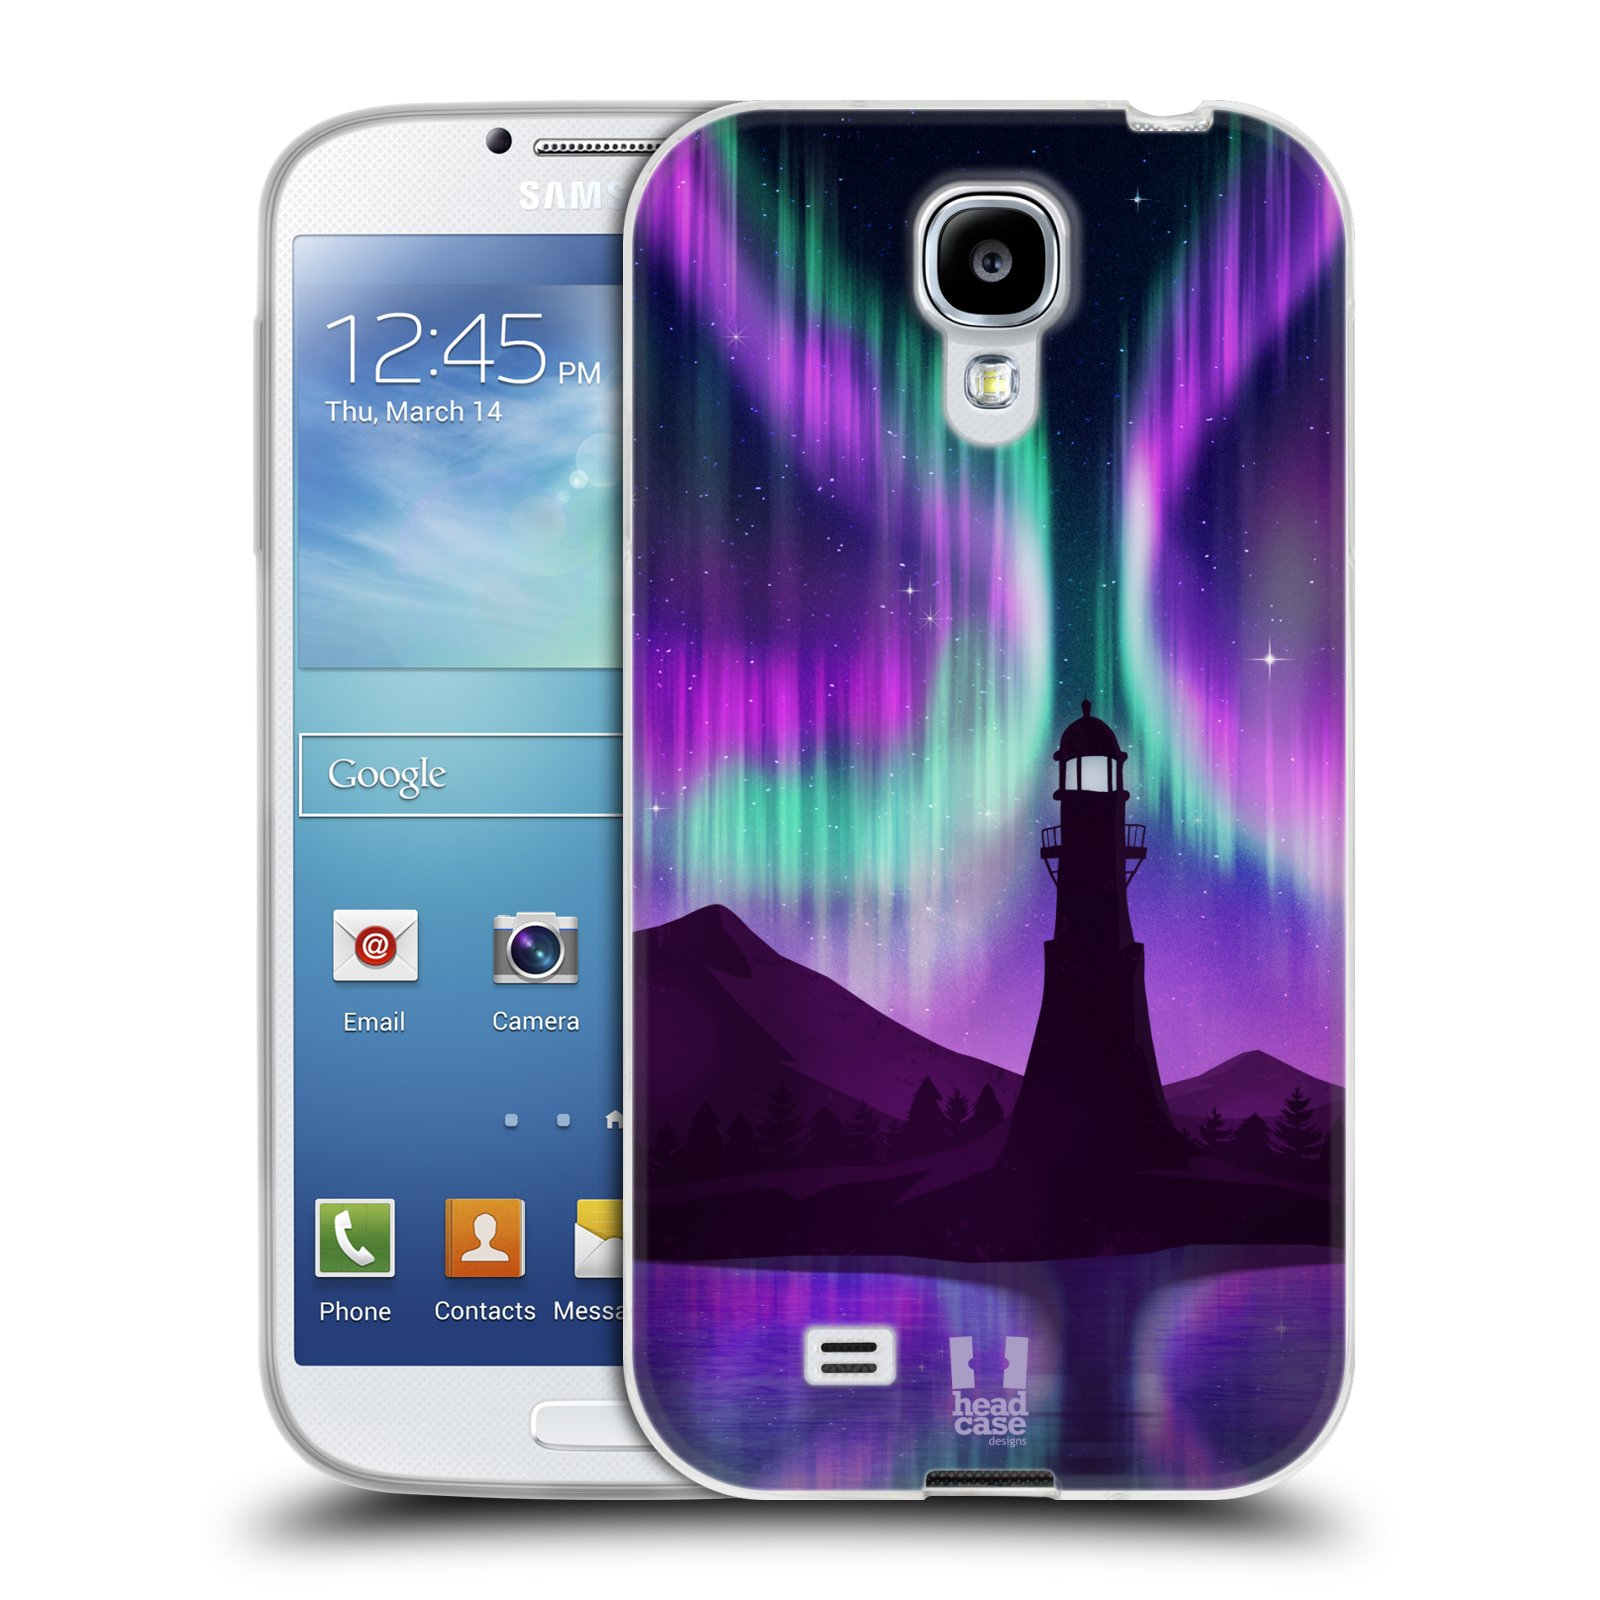 Silikonové pouzdro na mobil Samsung Galaxy S4 HEAD CASE Polární Záře Maják (Silikonový kryt či obal na mobilní telefon Samsung Galaxy S4 GT-i9505 / i9500)